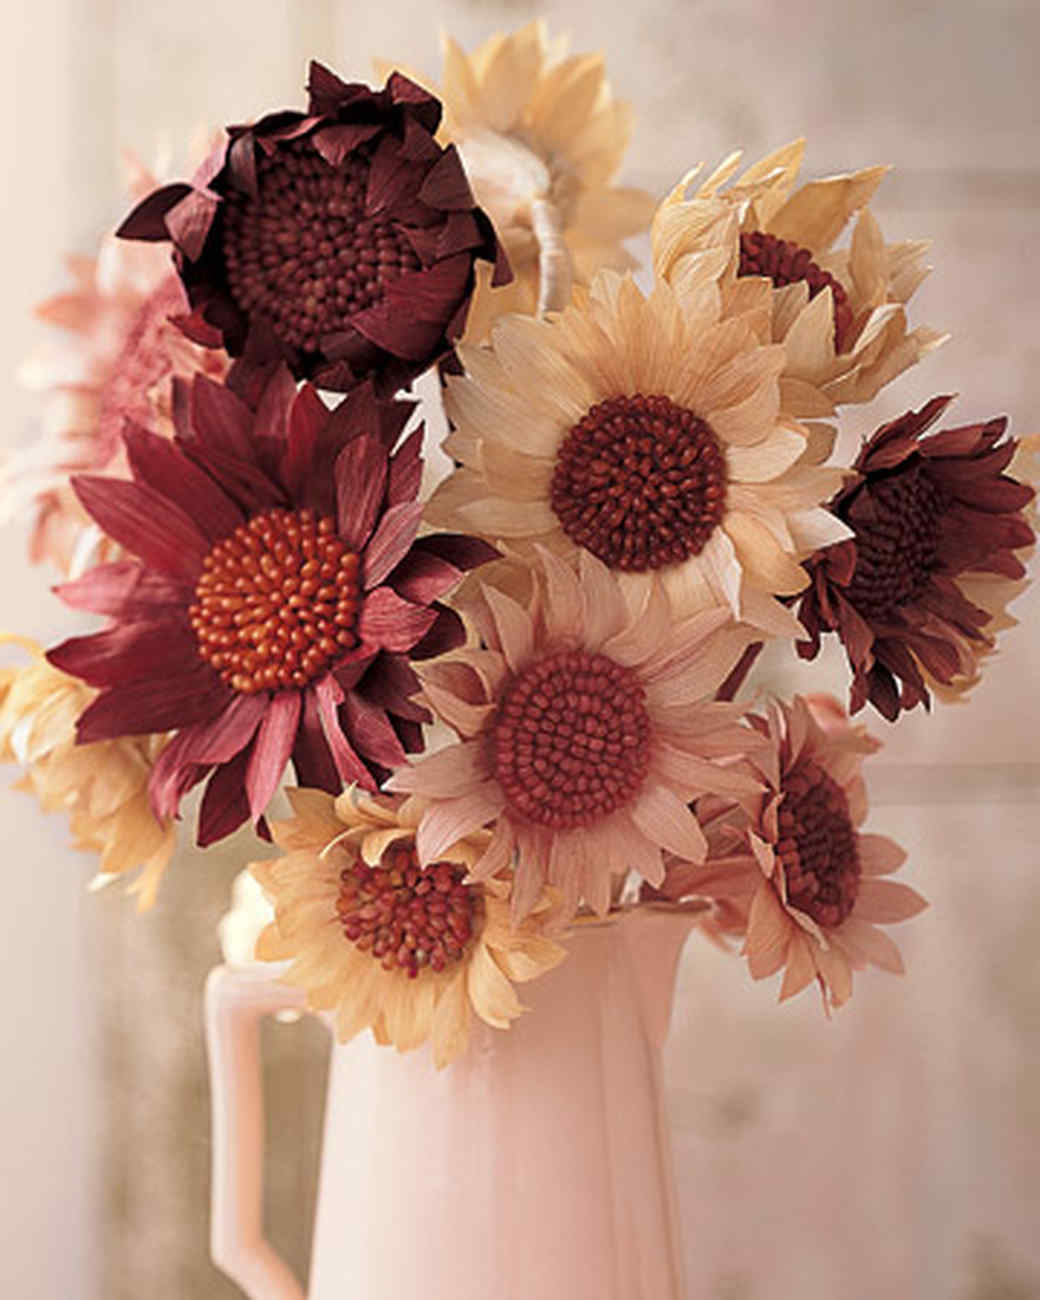 How to Make Cornhusk Flowers | Martha Stewart